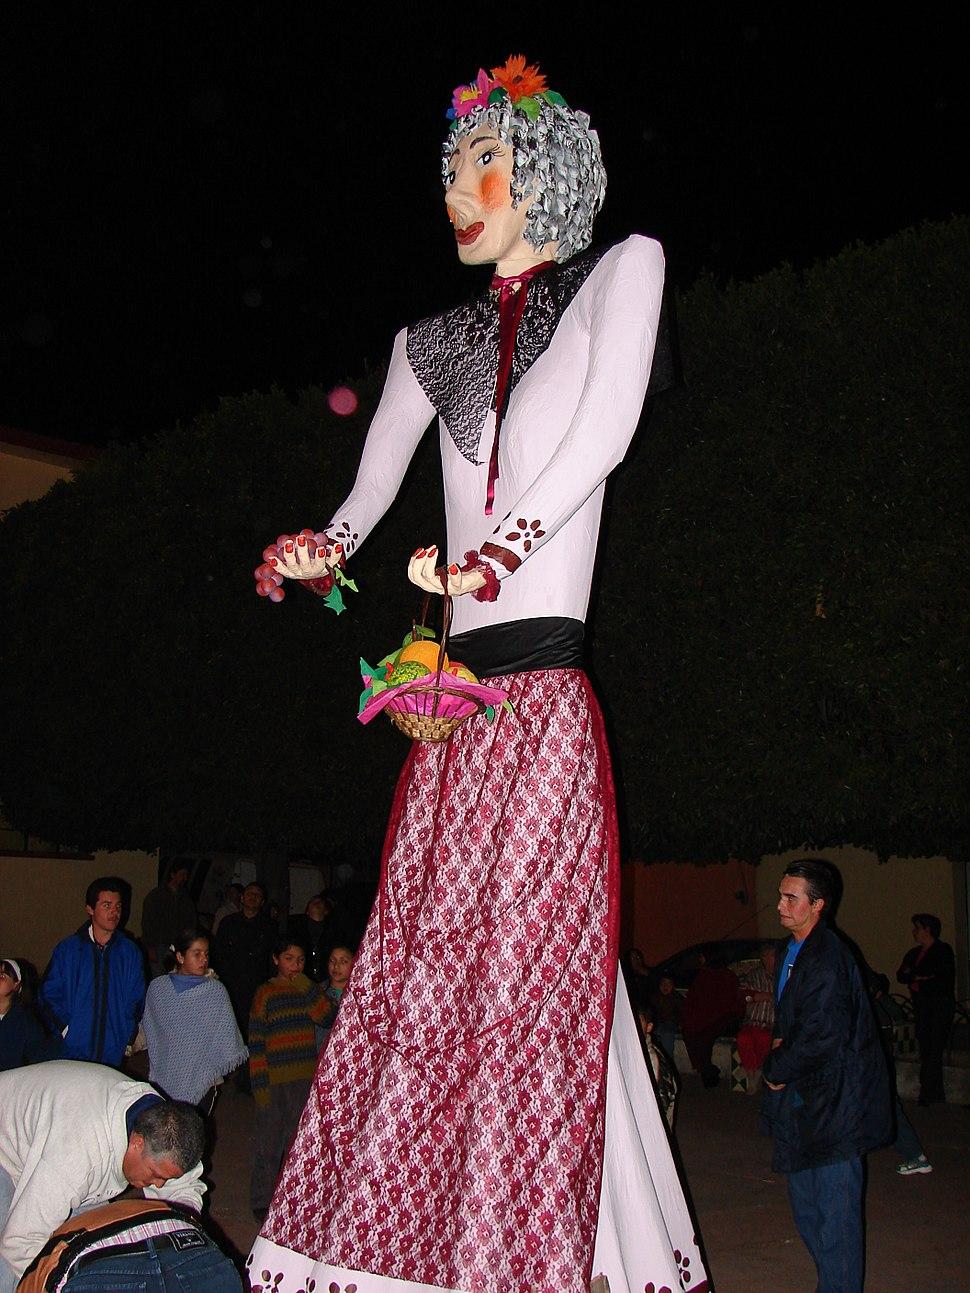 Befana, an ornately-dressed woman